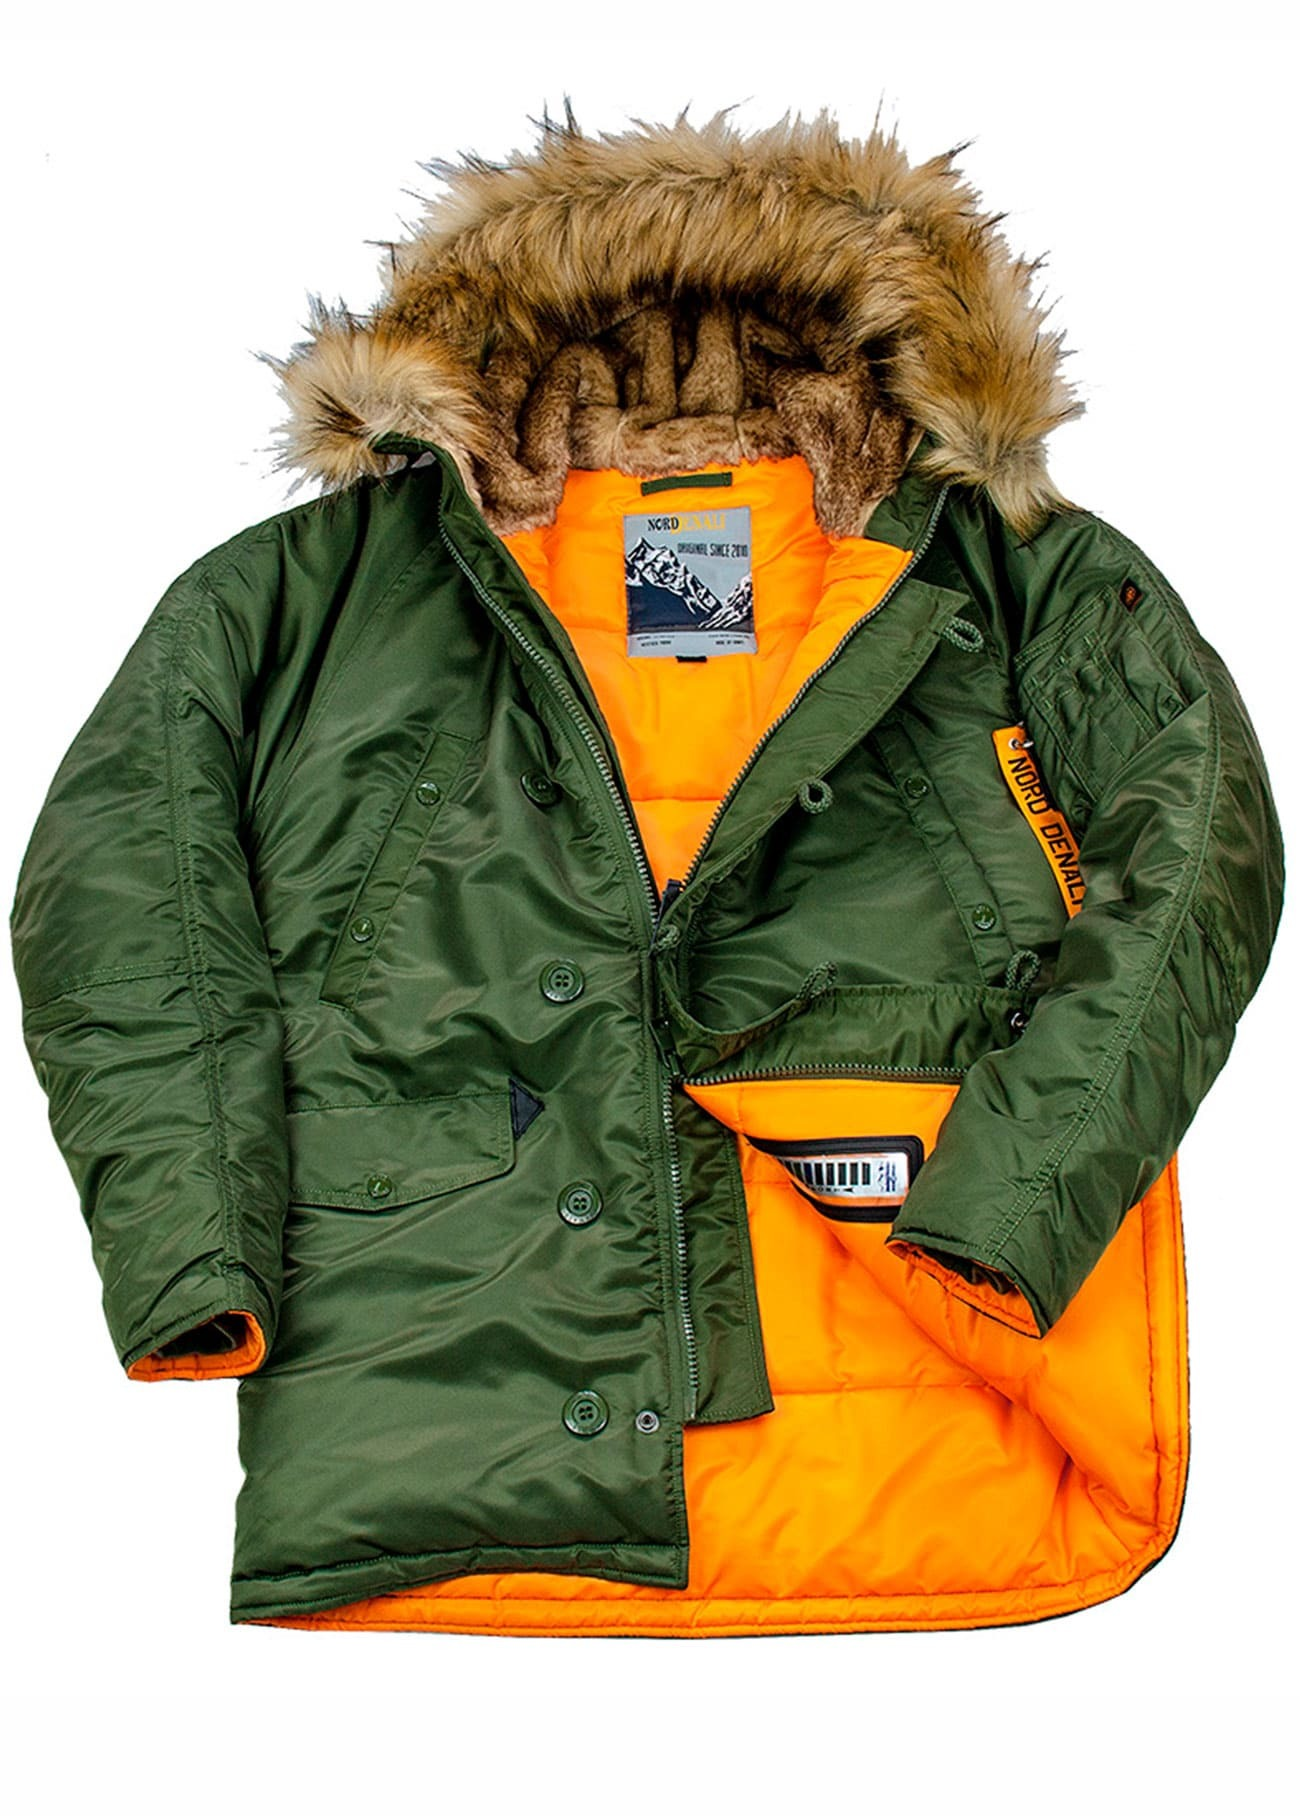 Куртка Аляска  N-3B  Husky Denali  2019 (зеленая - r.green/orange)